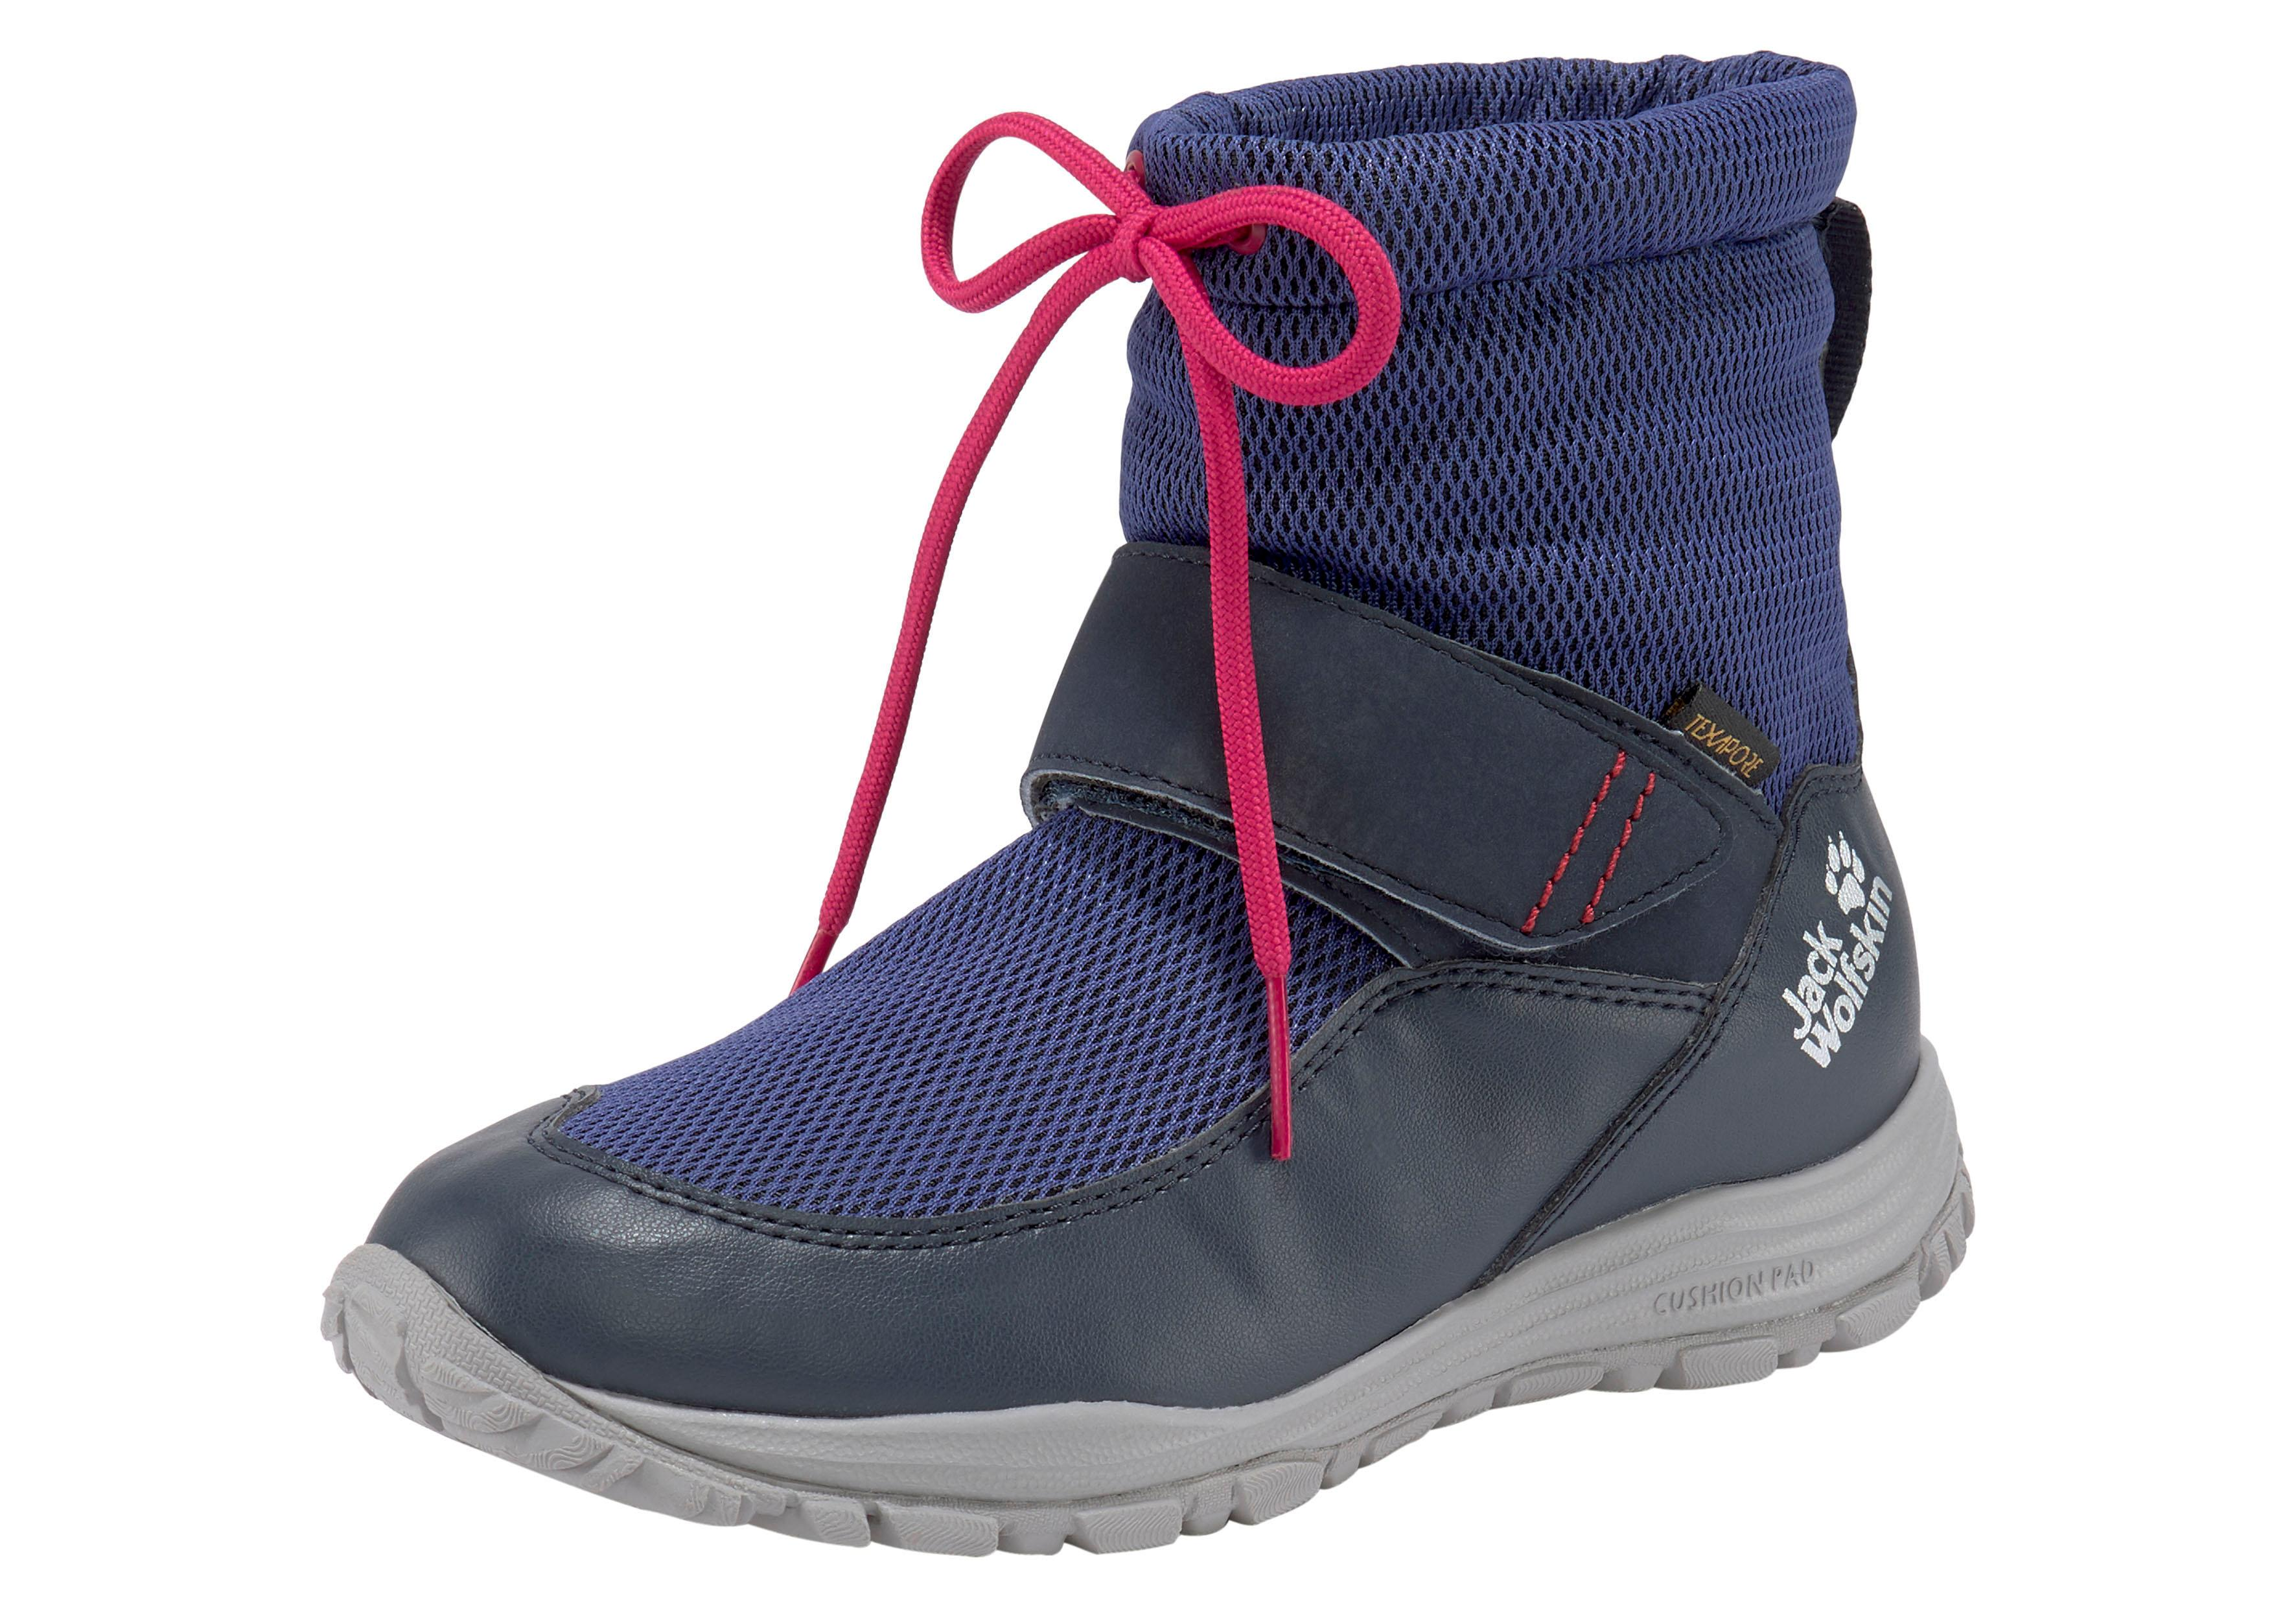 Jack Wolfskin Outdoorwinterstiefel Kiwi winterized Texapore Mid K | Schuhe > Outdoorschuhe > Outdoorwinterstiefel | Blau | Jack Wolfskin